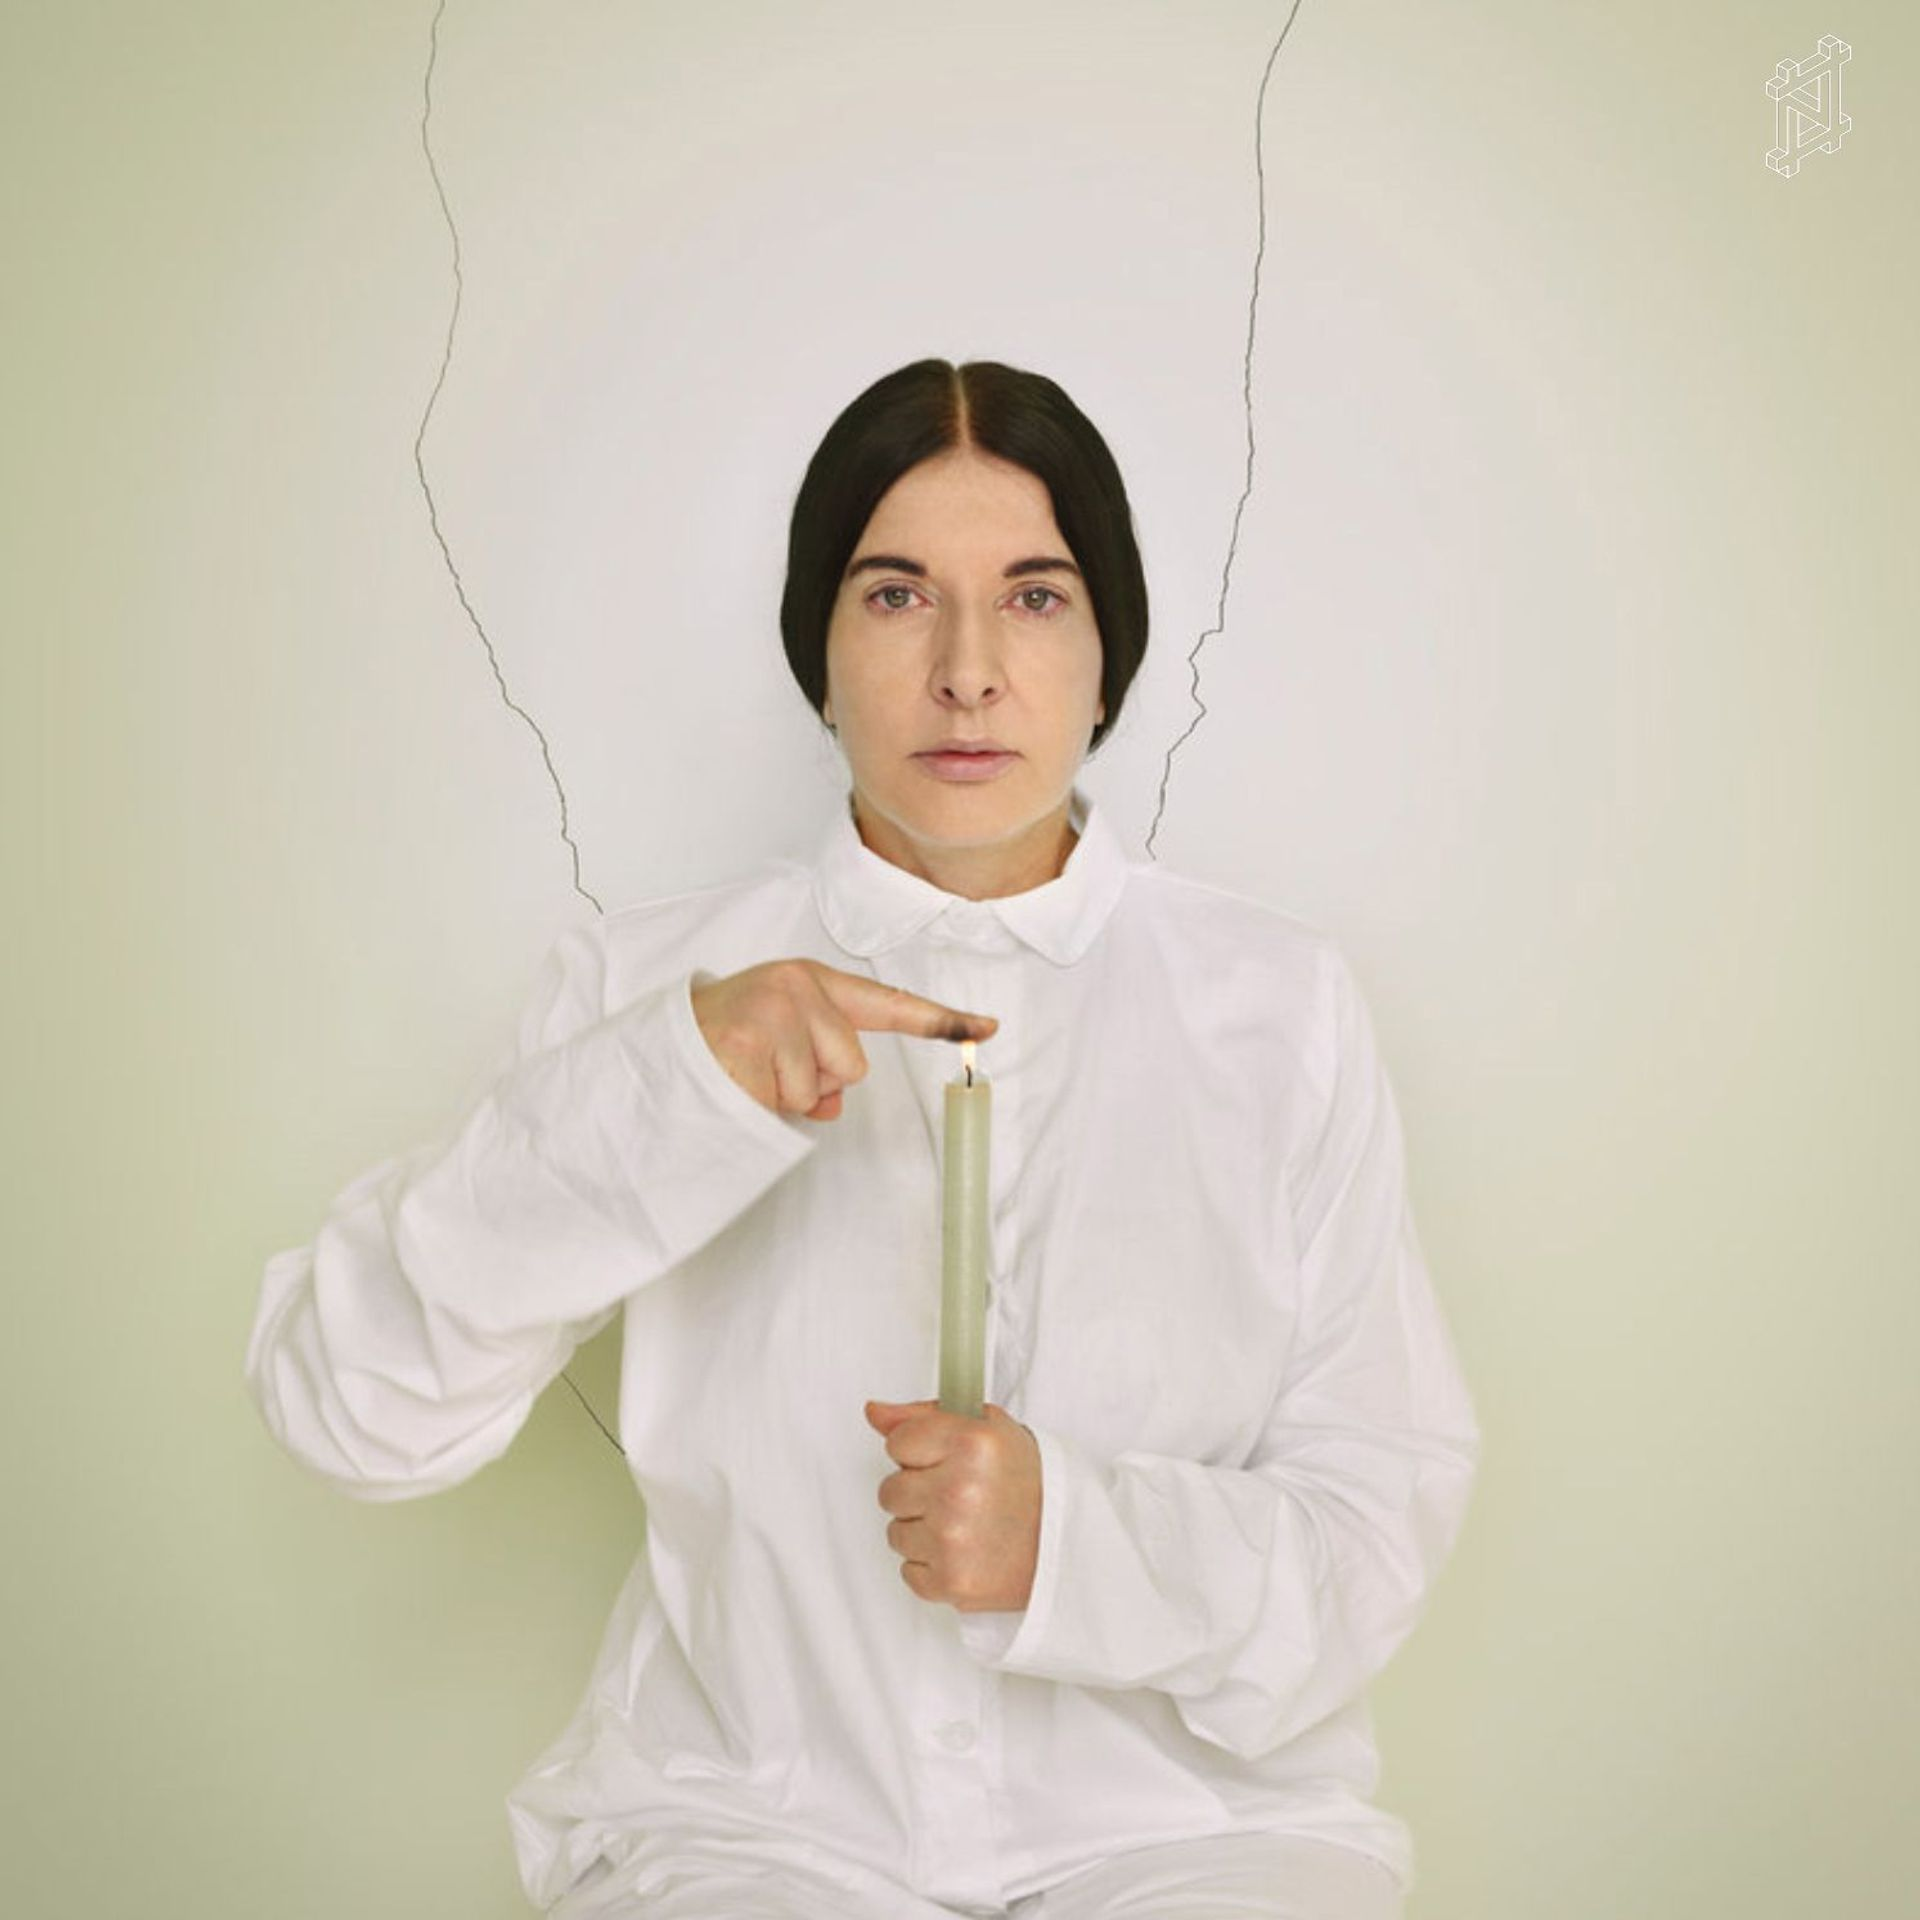 Still from Marina Abramović's Seven Deaths of Maria Callas (2020) © Marina Abramović